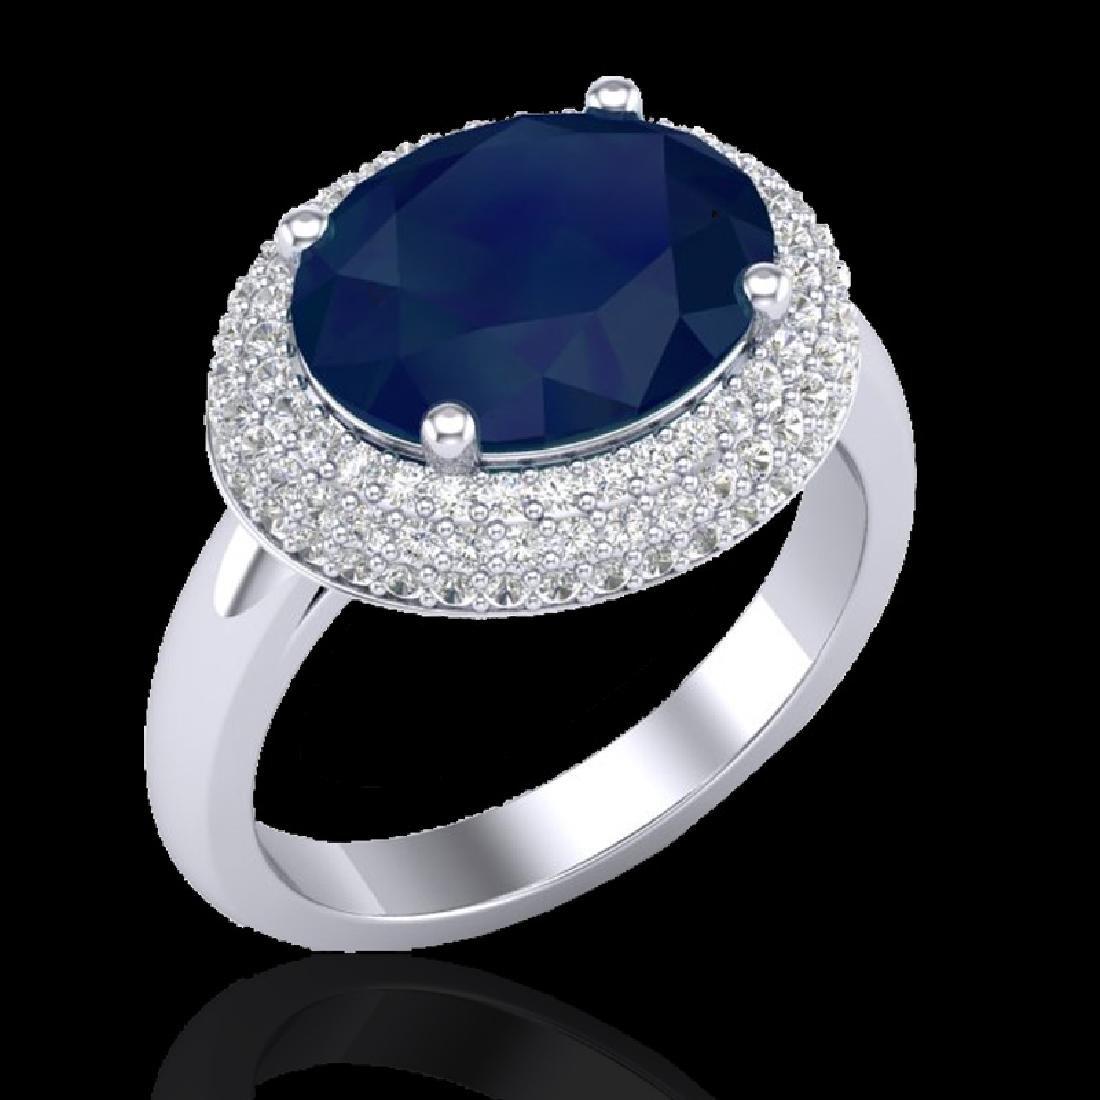 4.50 CTW Sapphire & Micro Pave VS/SI Diamond Ring 18K